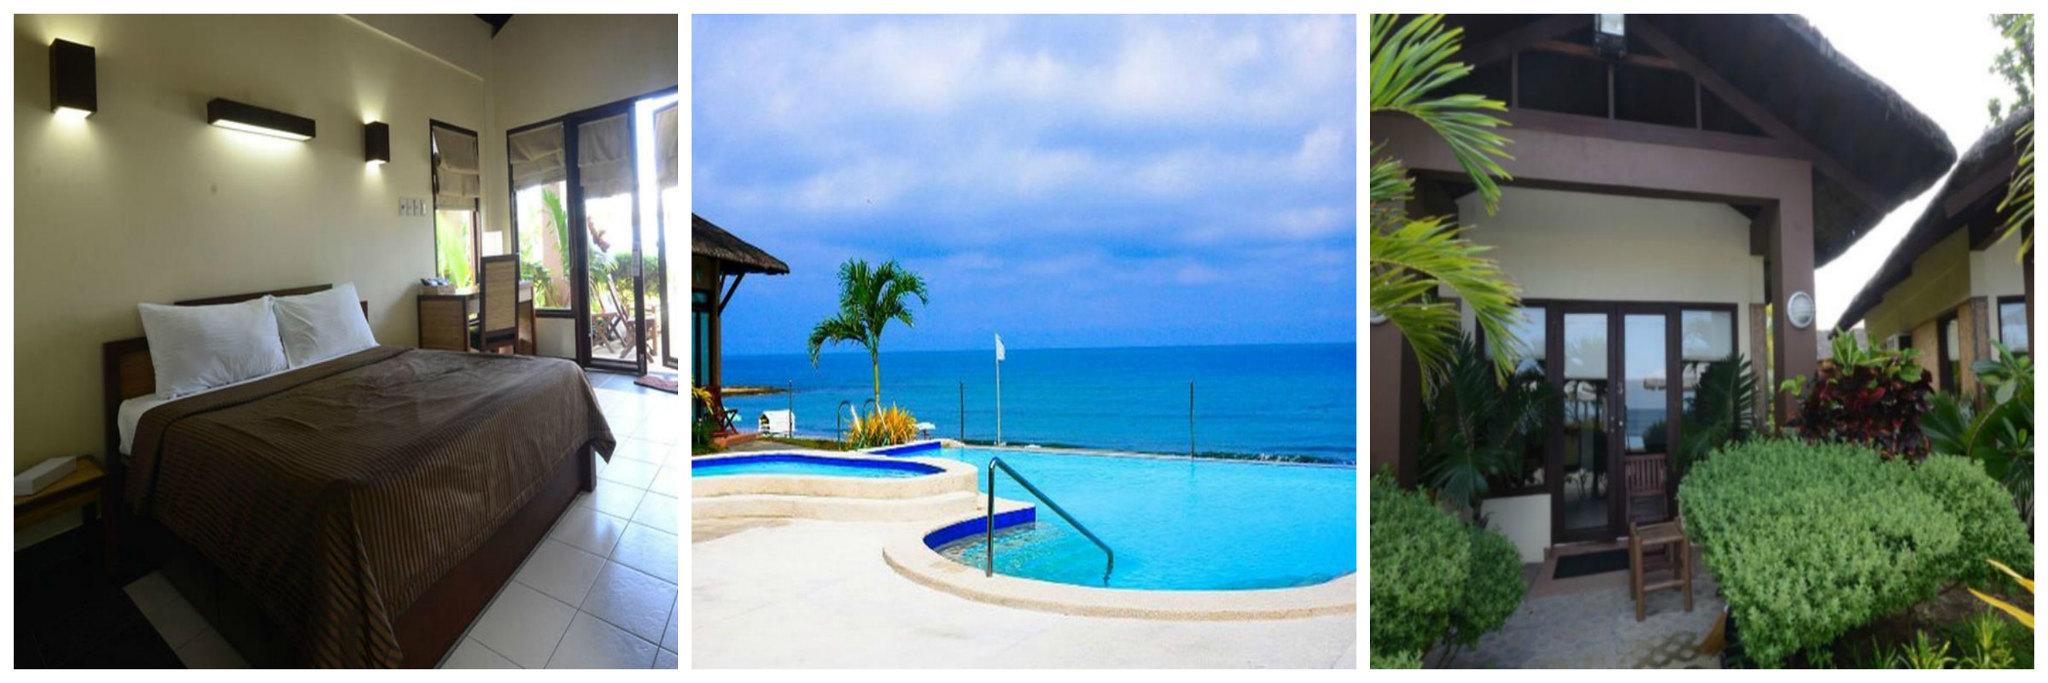 Kahuna Beach Resort And Spa Room Rates